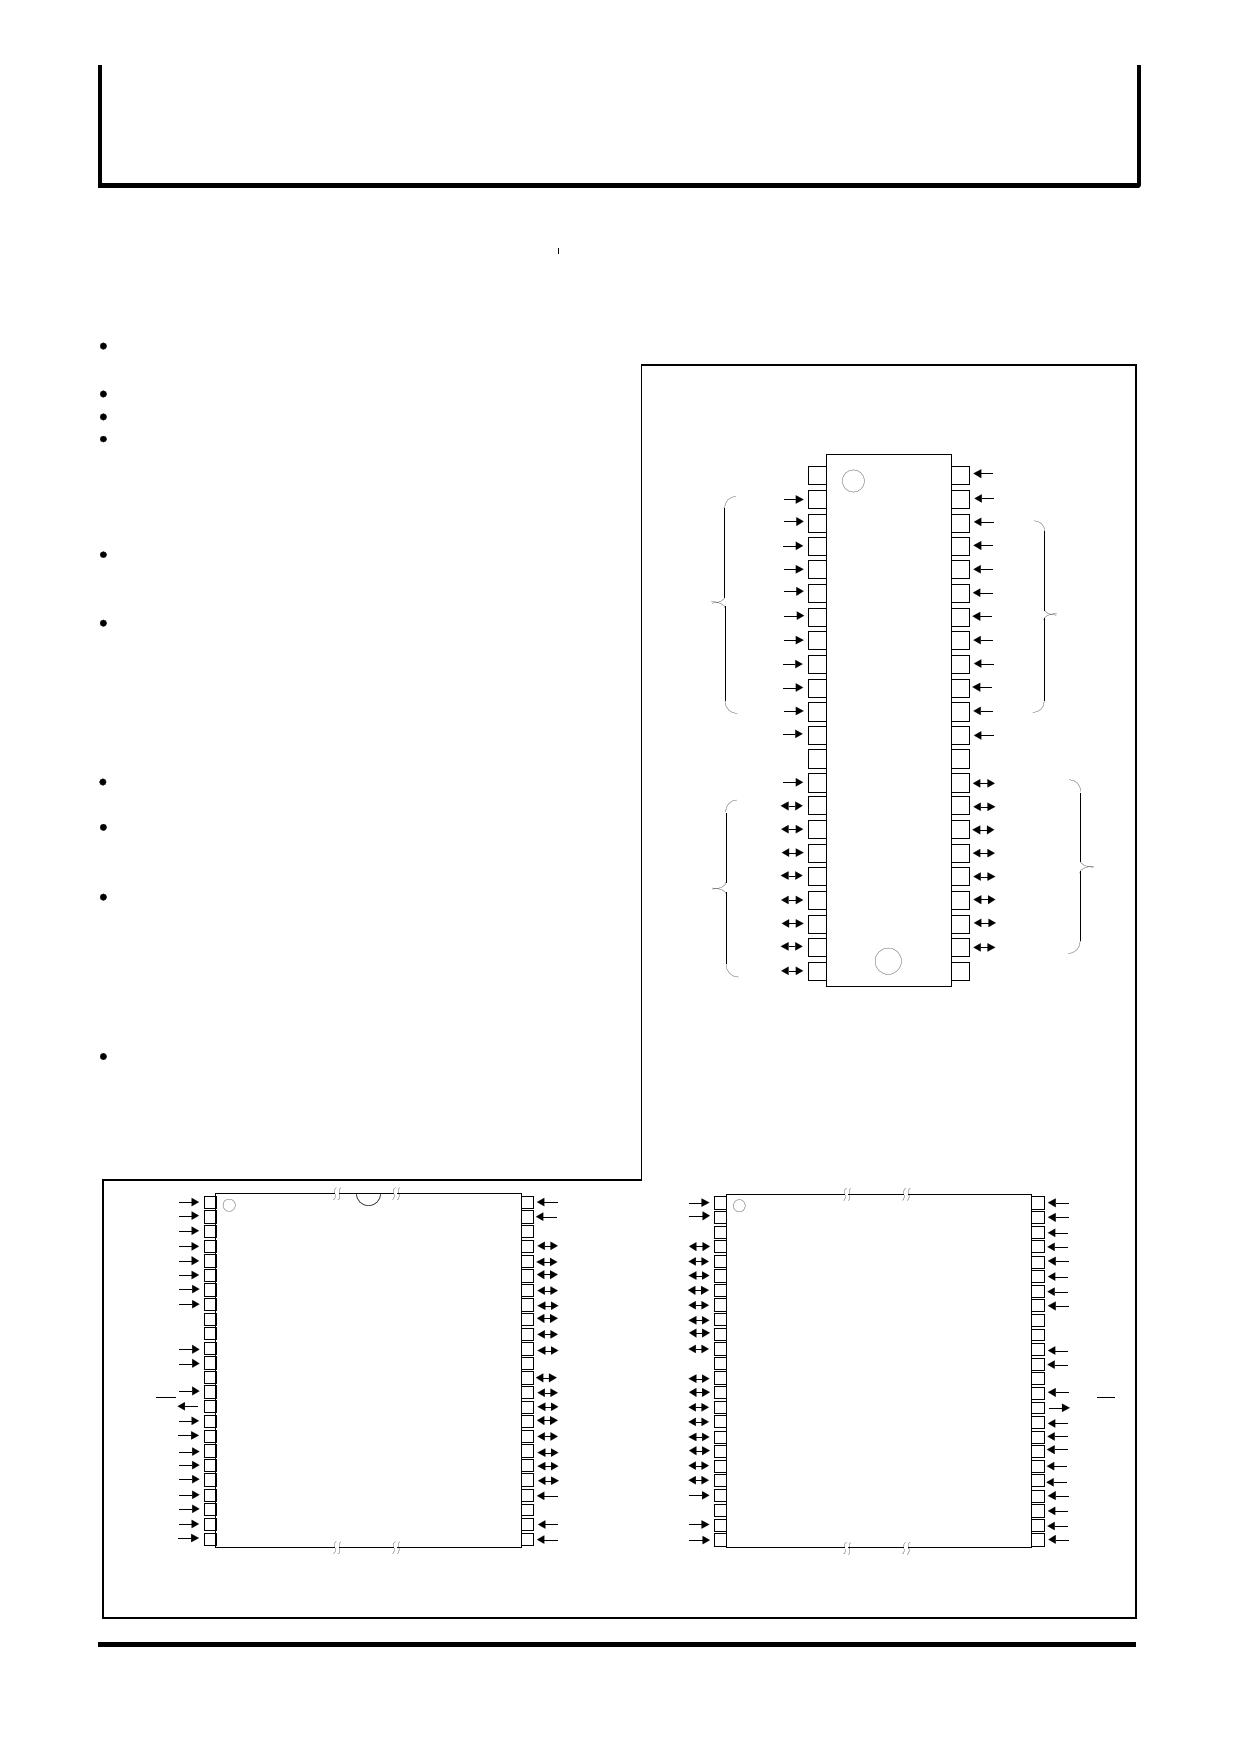 M5M29FB800VP-10 Datasheet, M5M29FB800VP-10 PDF,ピン配置, 機能